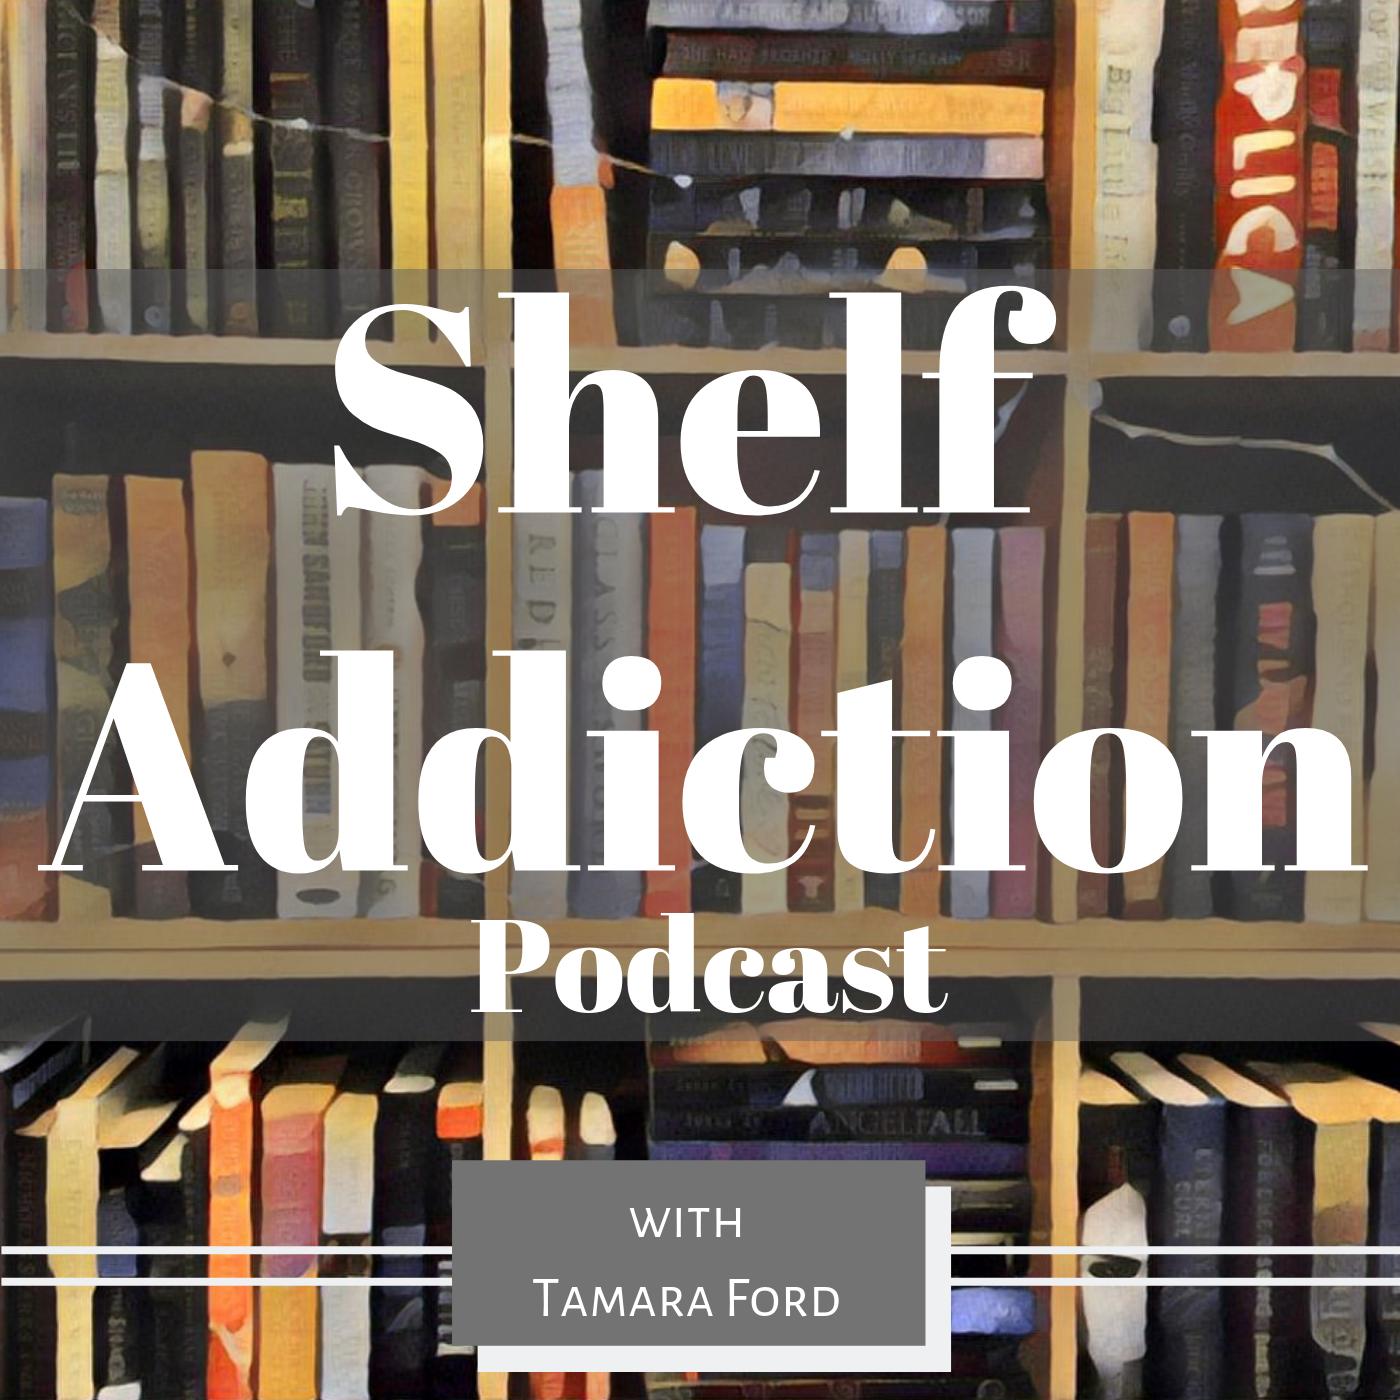 Shelf Addiction Podcast podcast show image